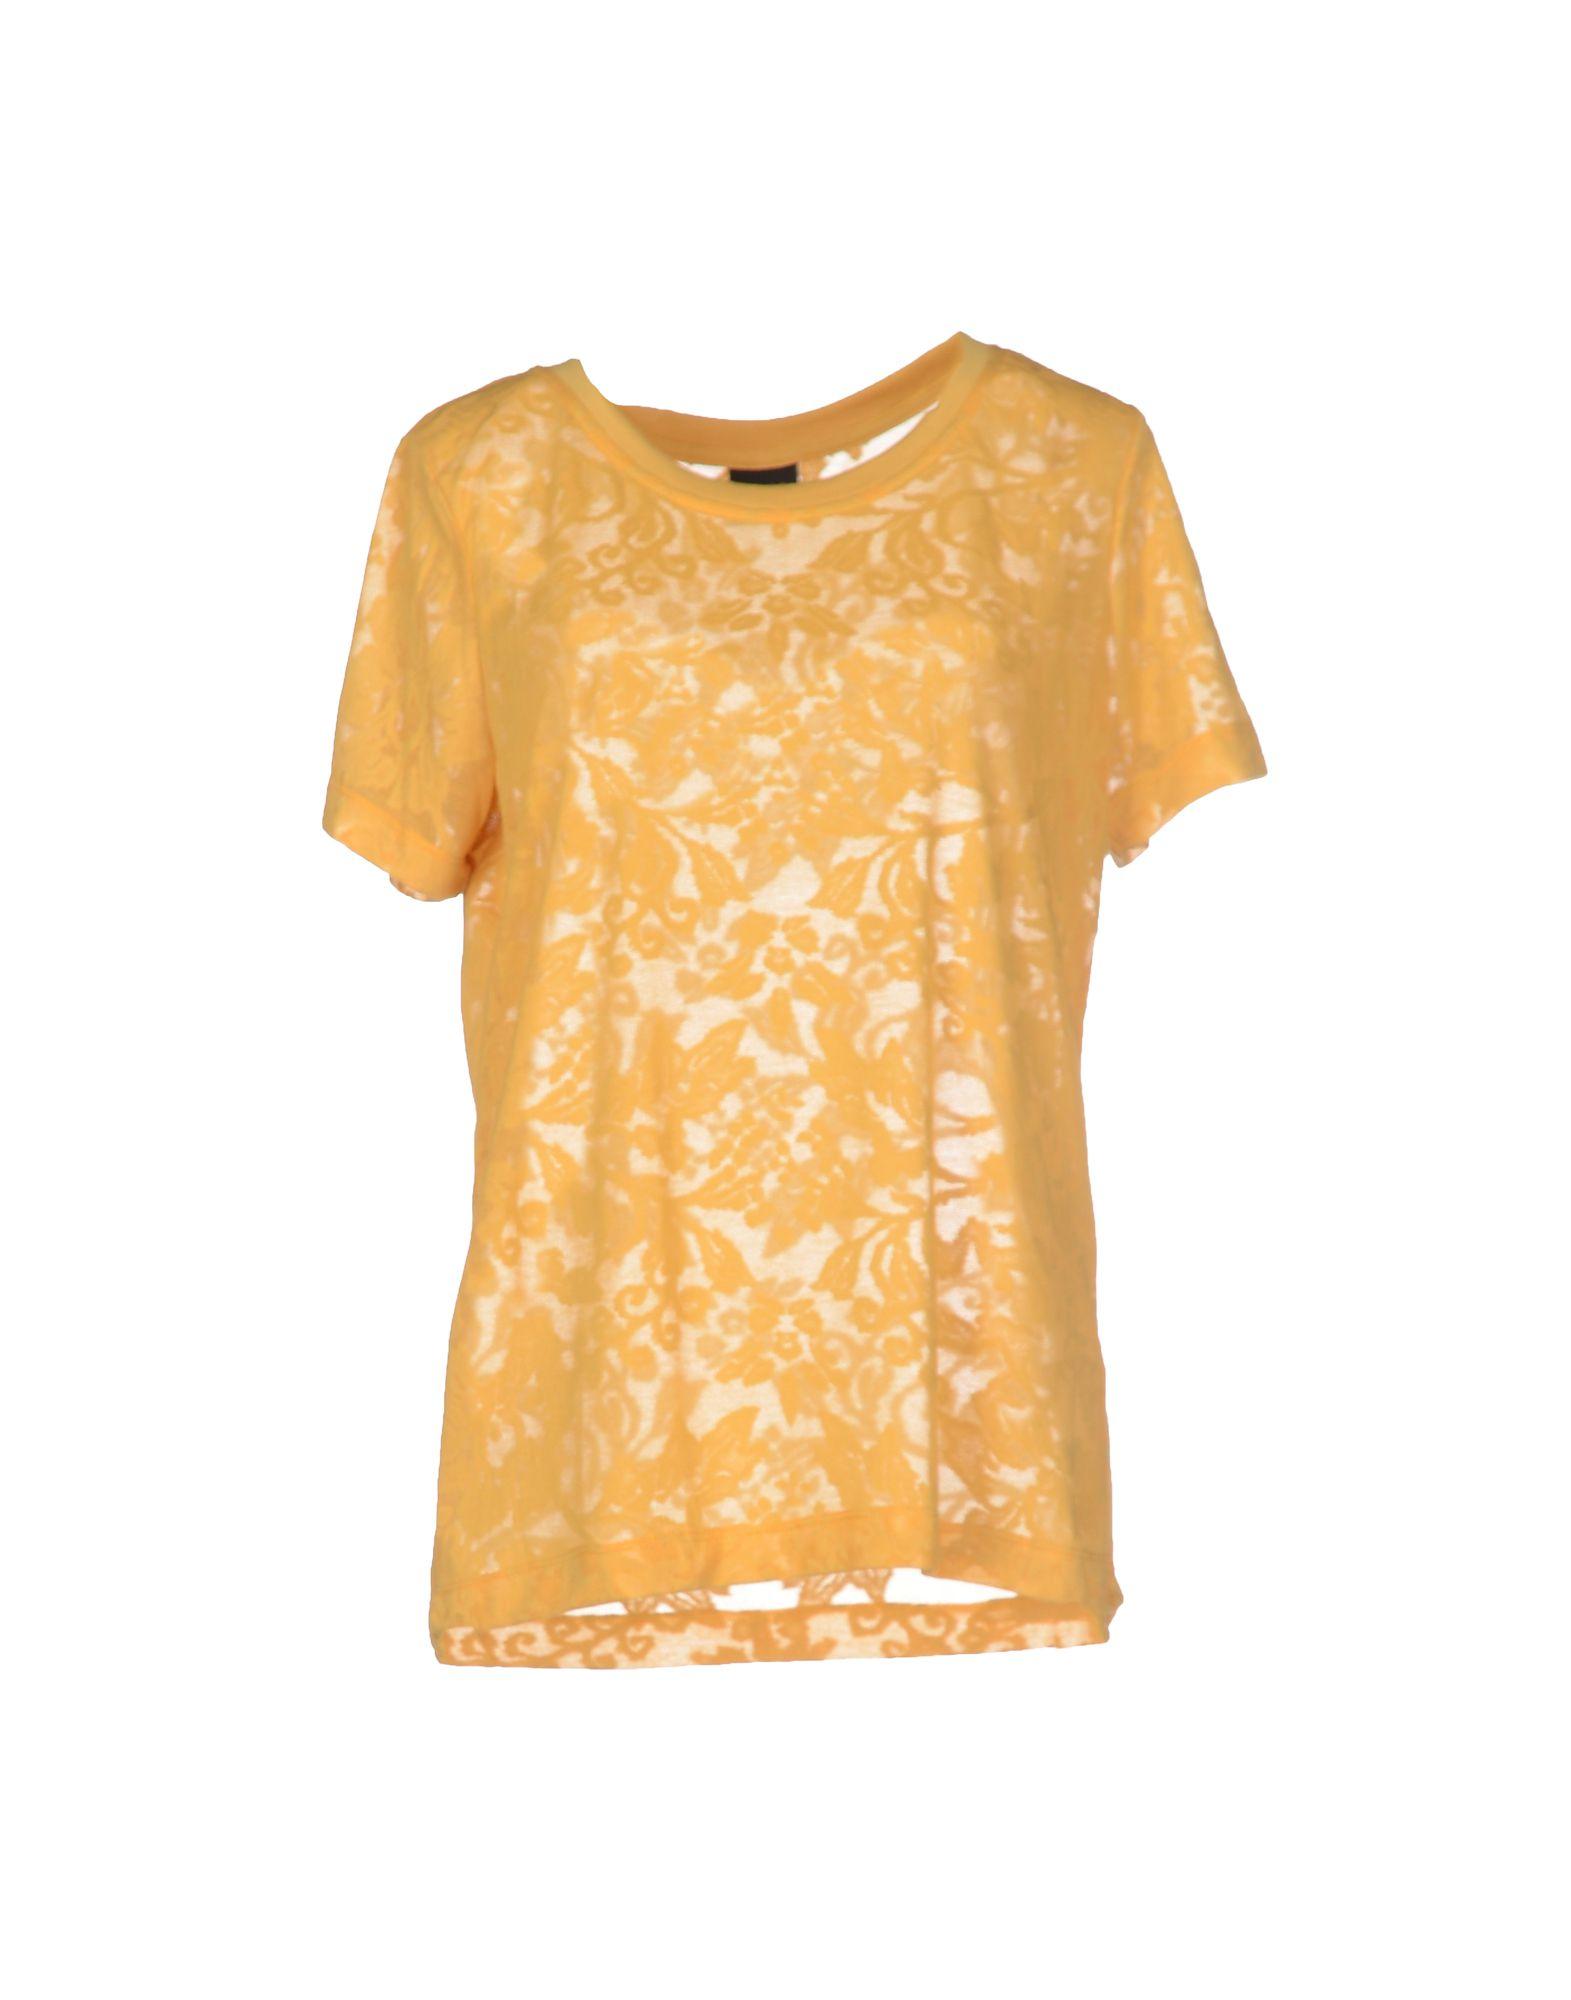 SELECTED FEMME Футболка selected femme футболка